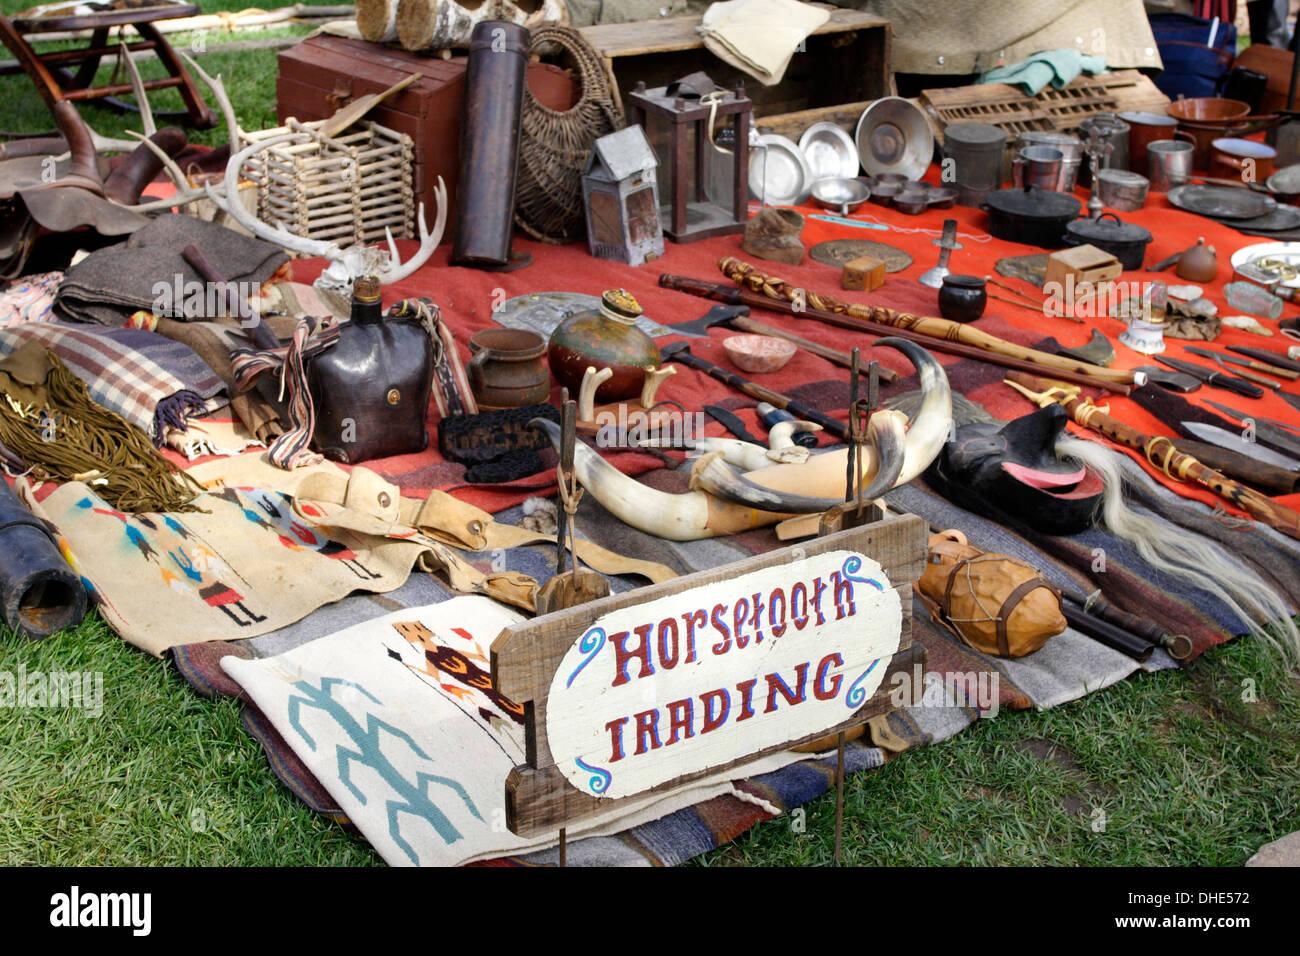 fair trade goods stockfotos fair trade goods bilder alamy. Black Bedroom Furniture Sets. Home Design Ideas